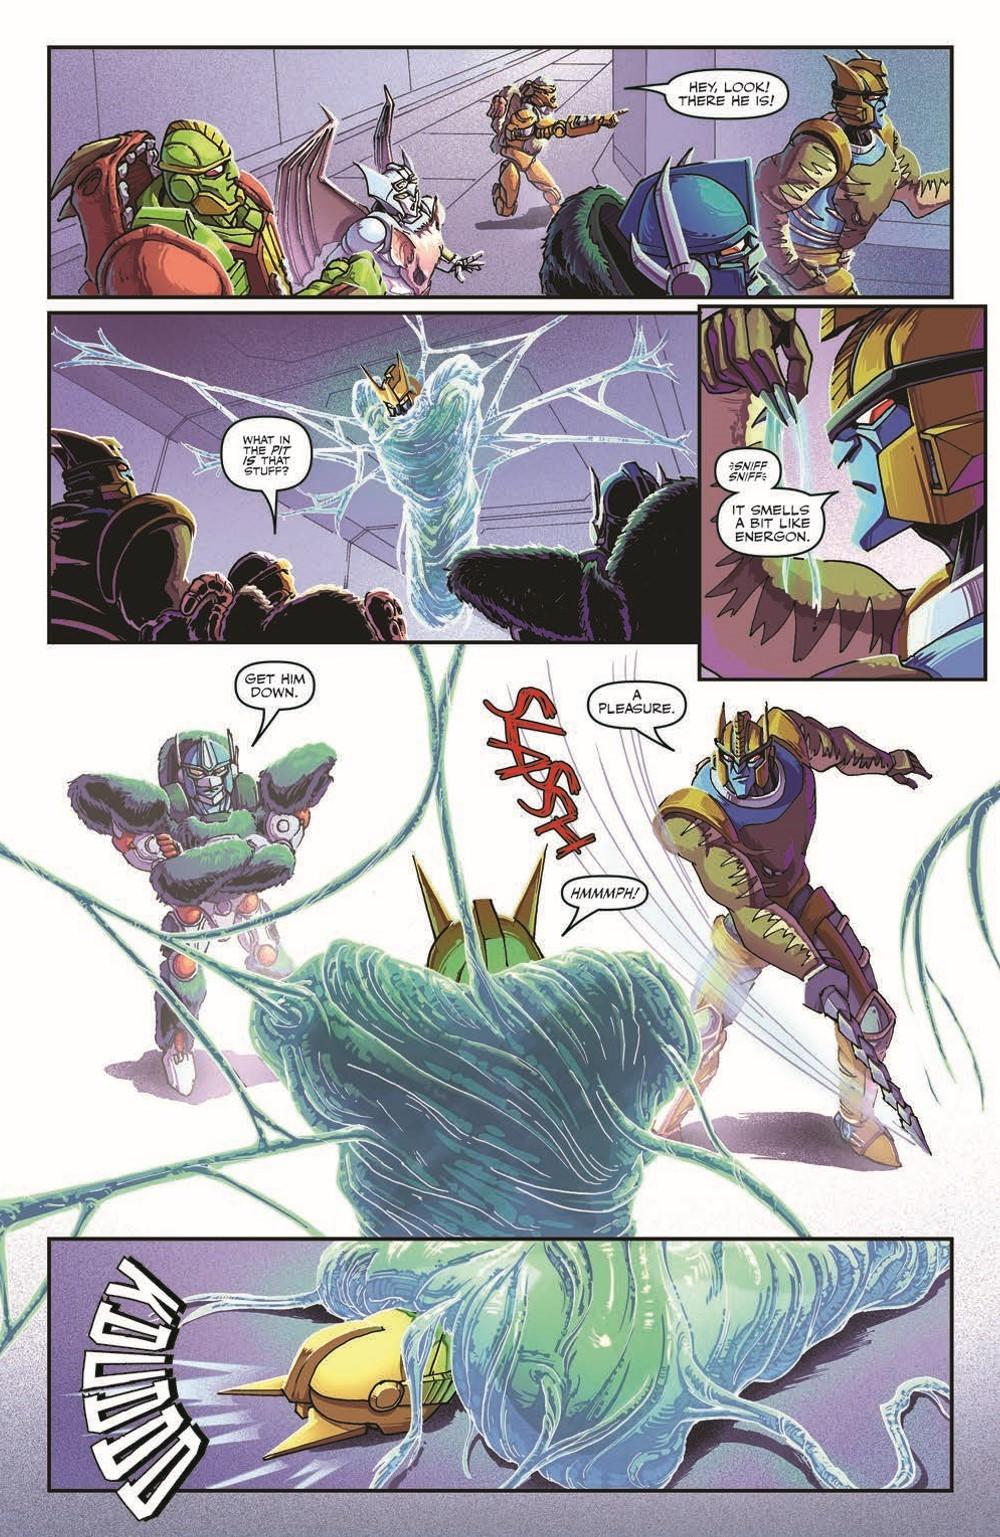 TFBW_08_pr-4 ComicList Previews: TRANSFORMERS BEAST WARS #8